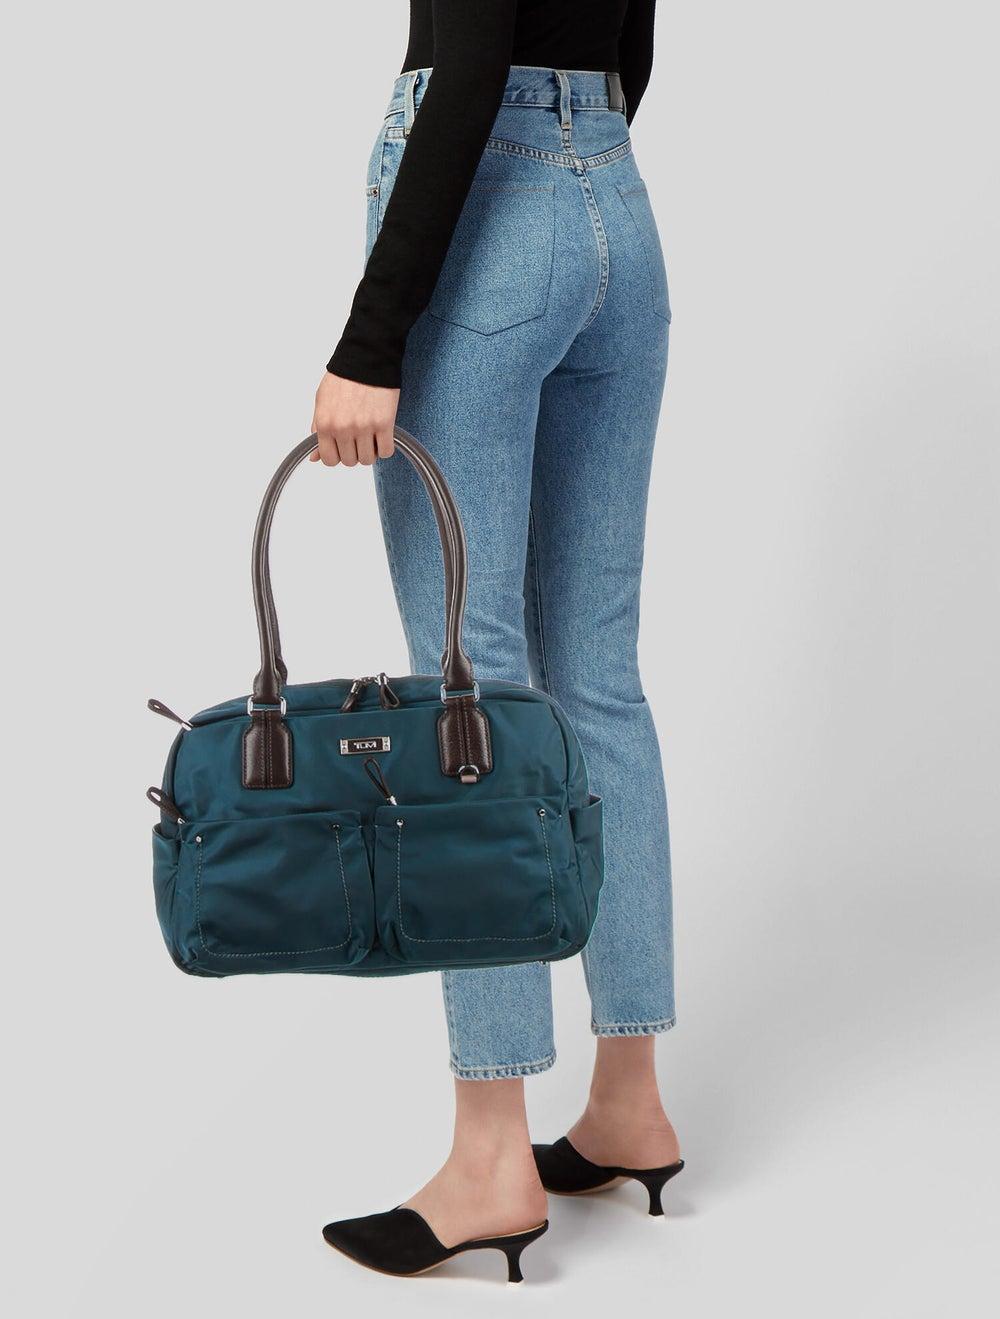 Tumi Nylon Shoulder Bag Blue - image 2